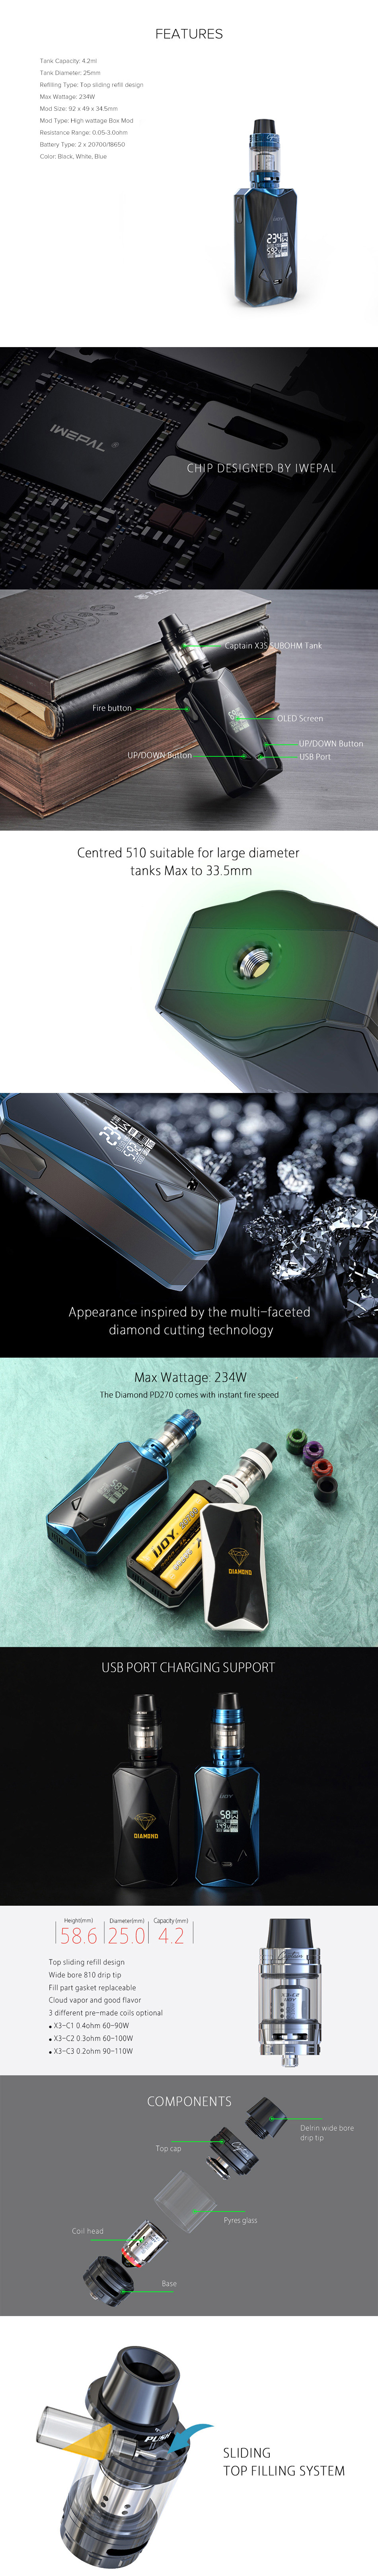 IJOY Diamond PD270 234W Kit Feature